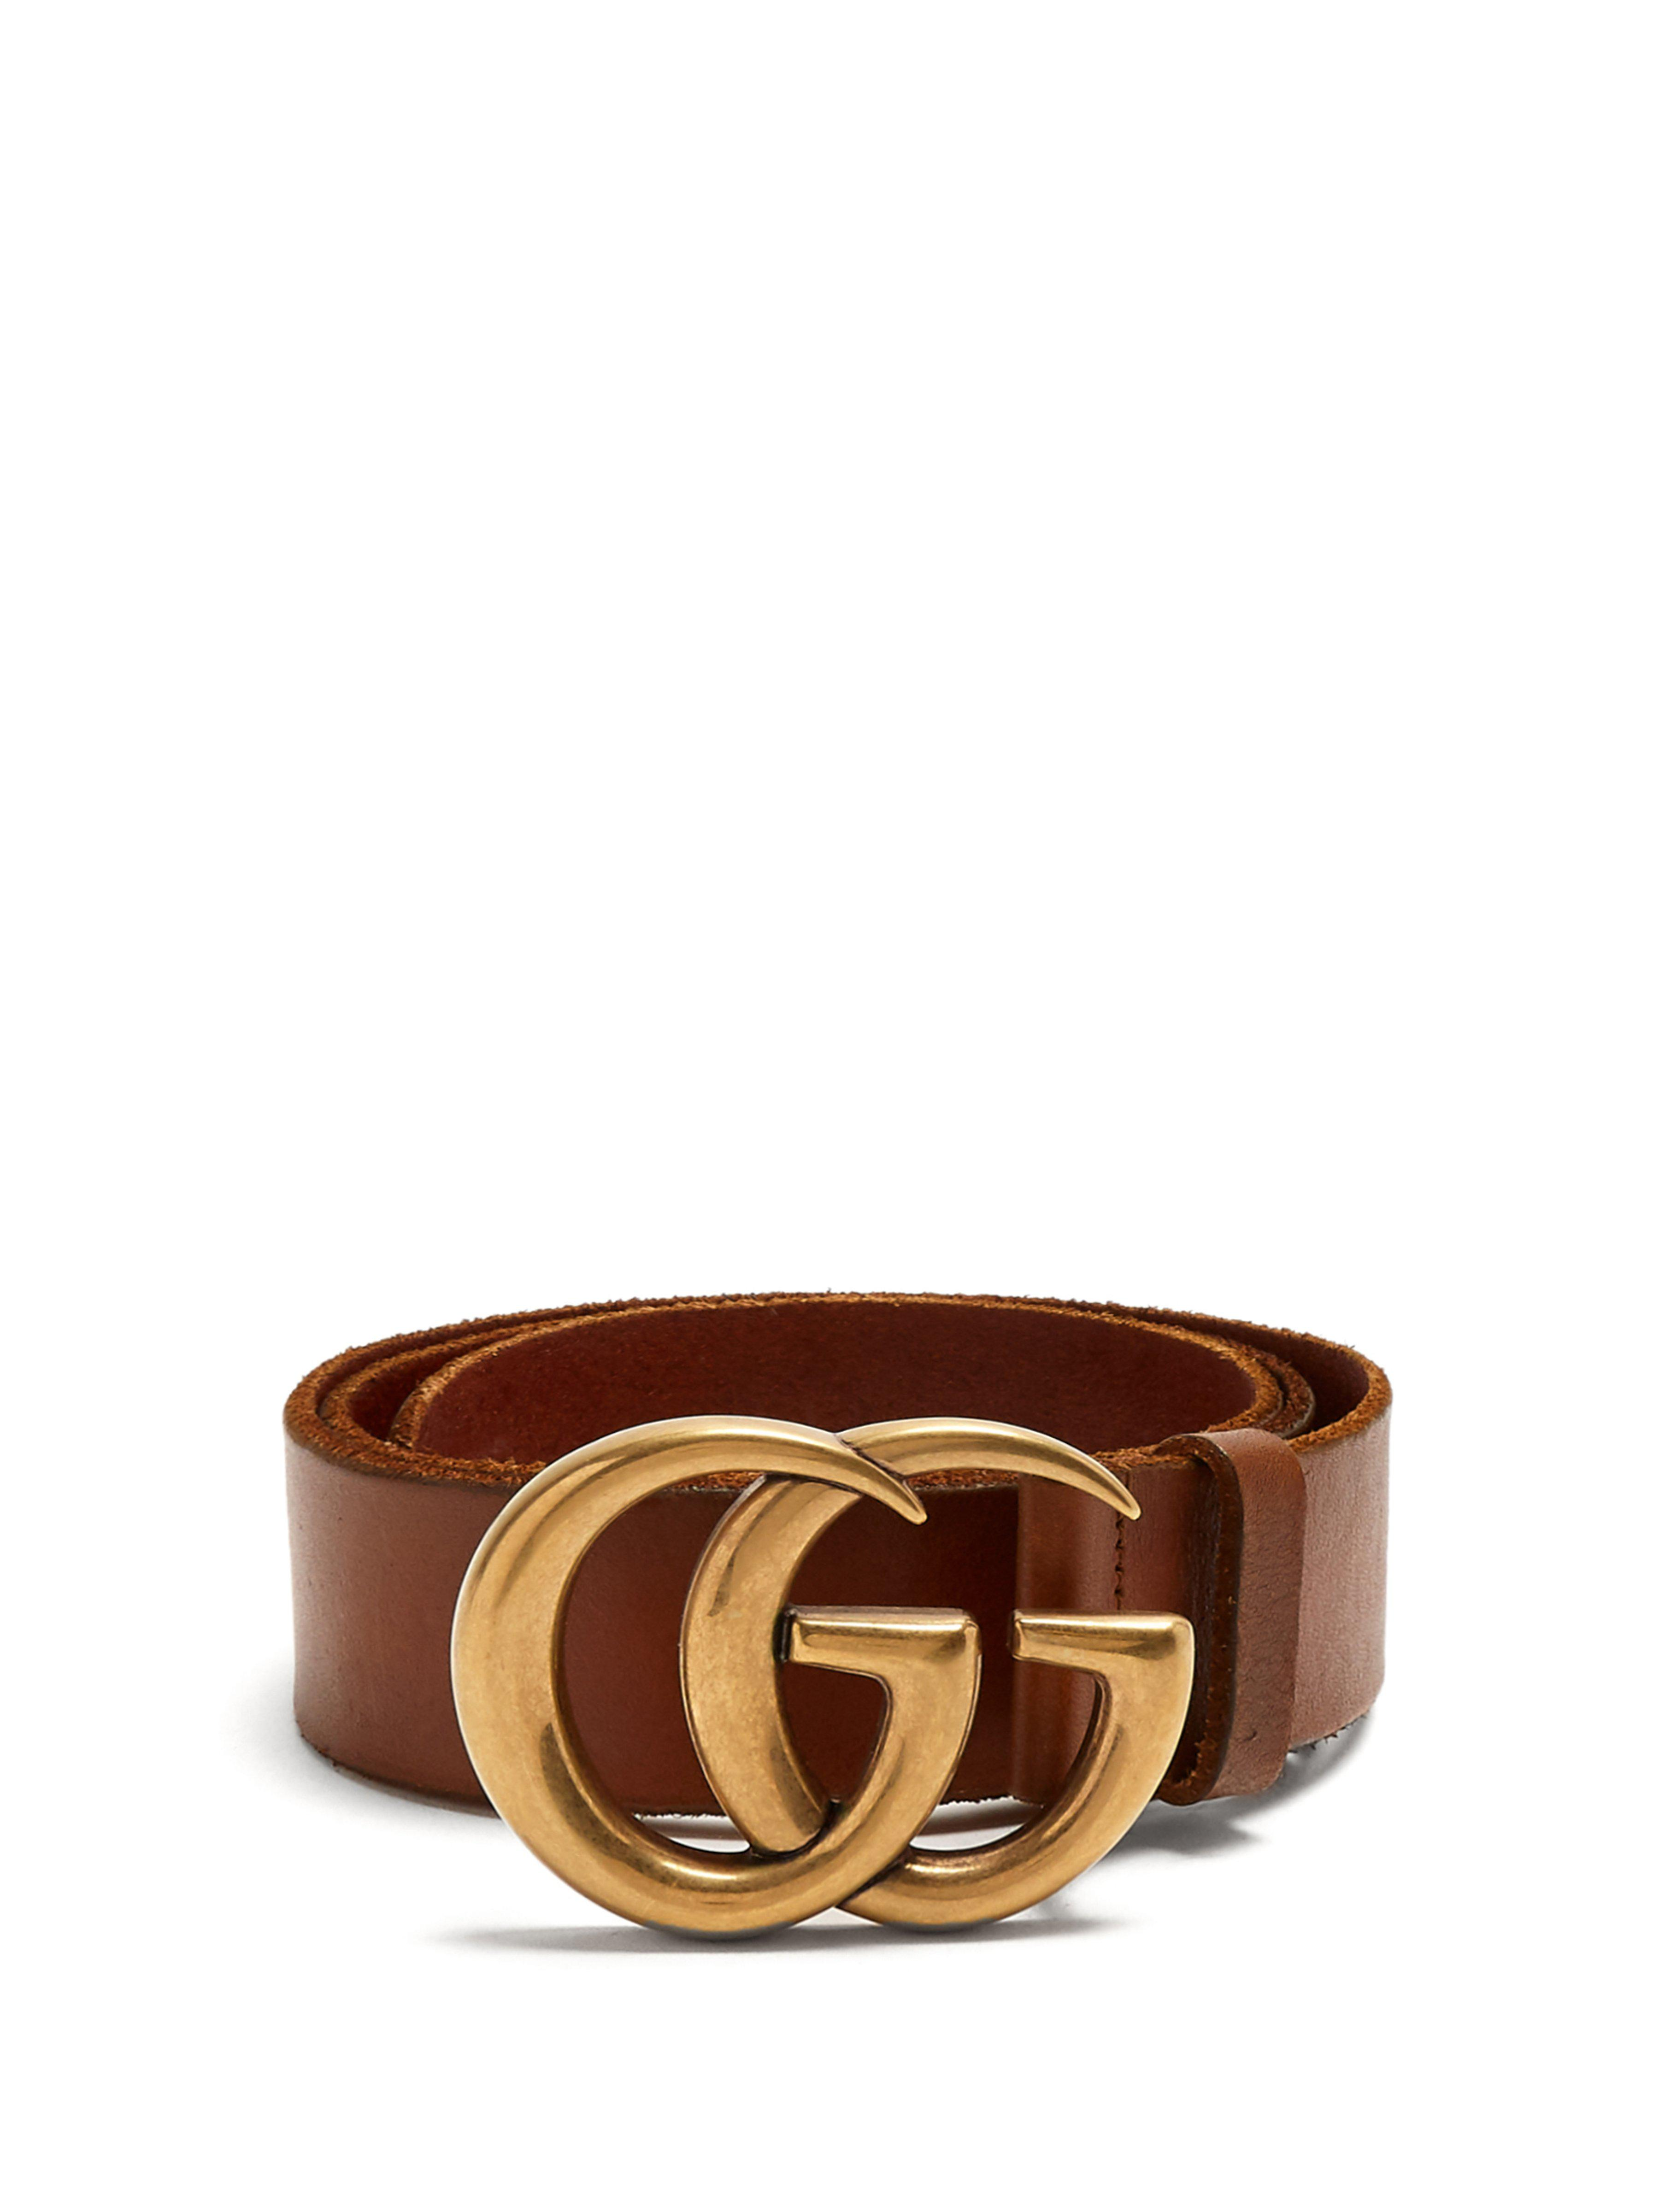 Lyst - Ceinture en cuir à logo GG Gucci en coloris Marron - 99 % de ... 038f926d2d4